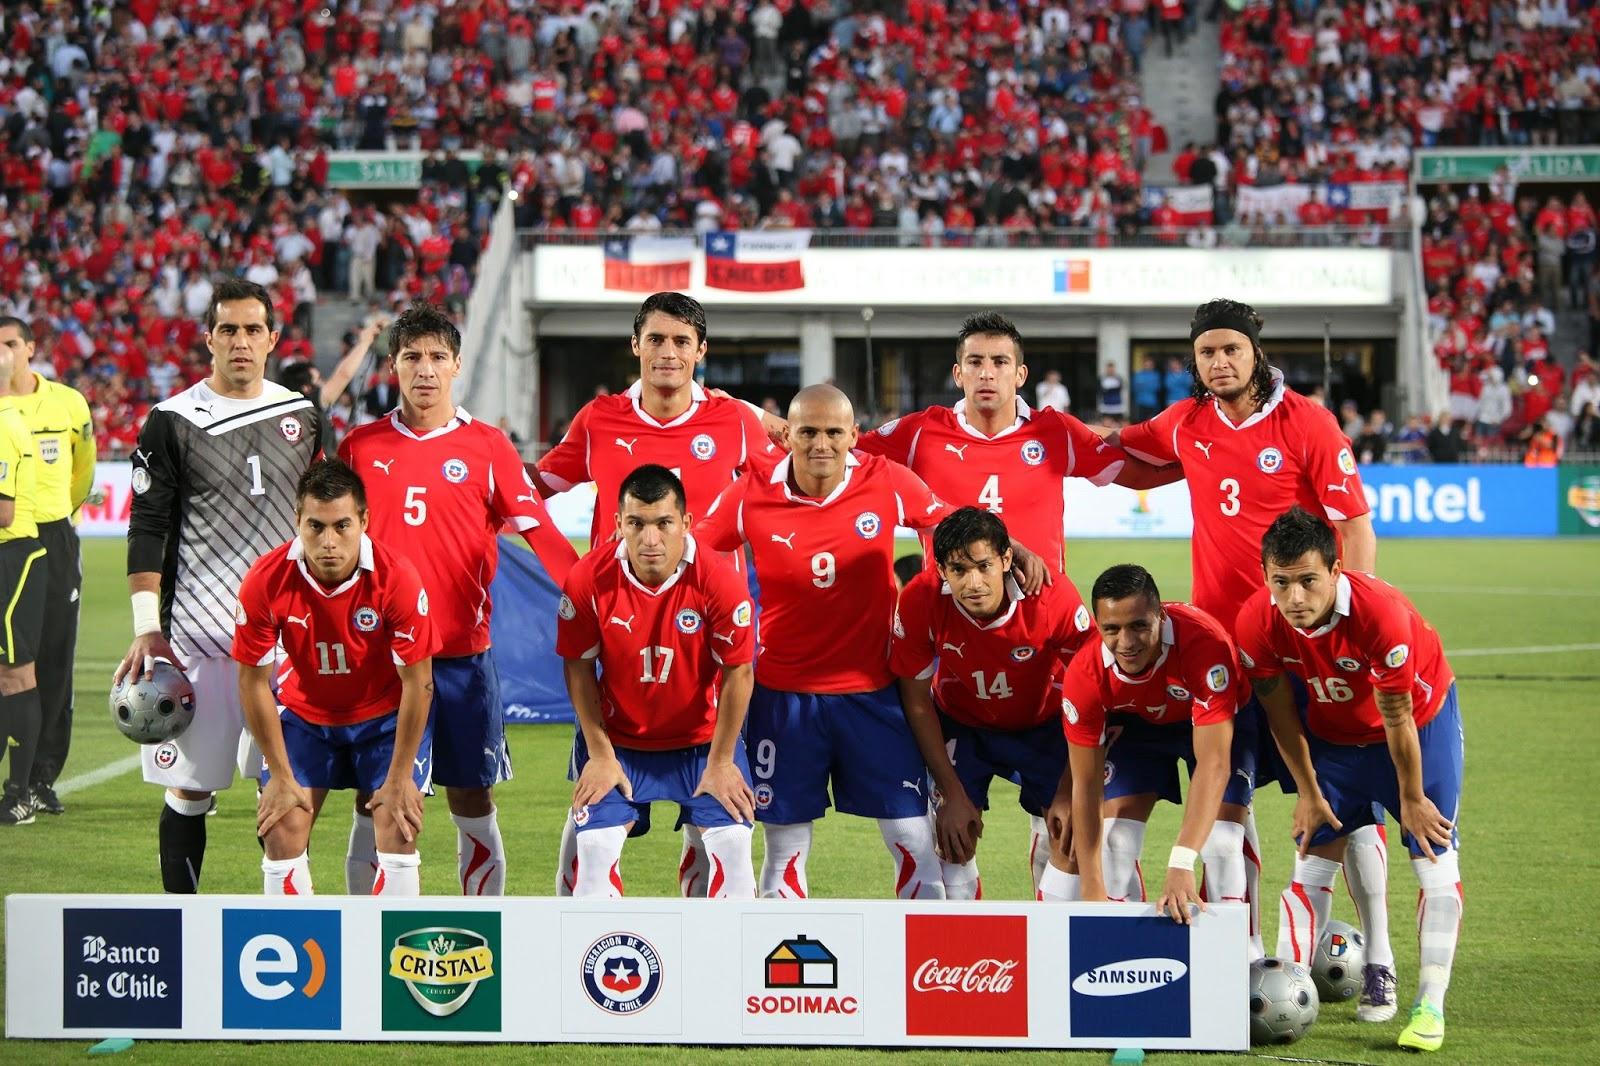 Formación de Chile ante Paraguay, Clasificatorias Brasil 2014, 15 de noviembre de 2011